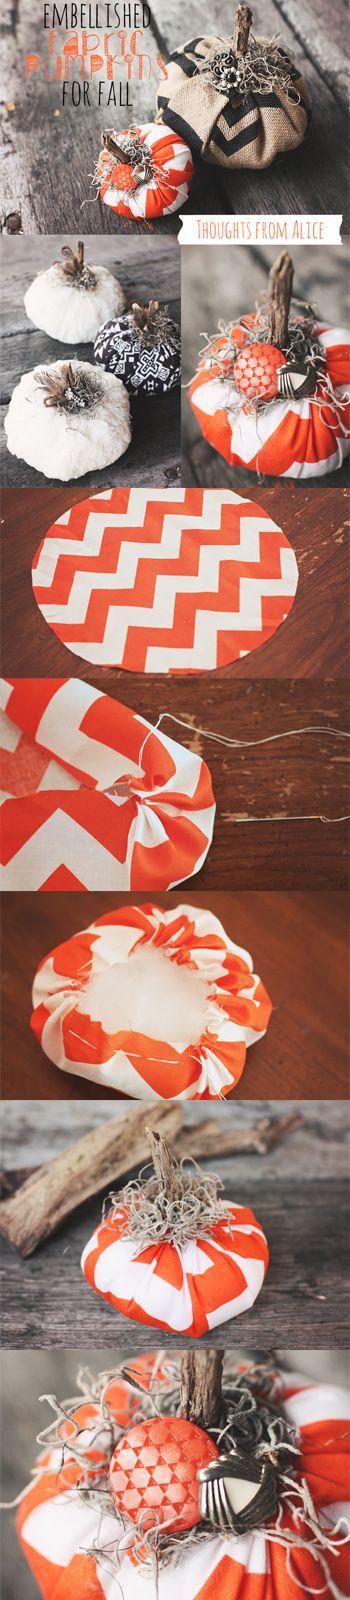 DIY Embellished Fabric Pumpkins for Fall.